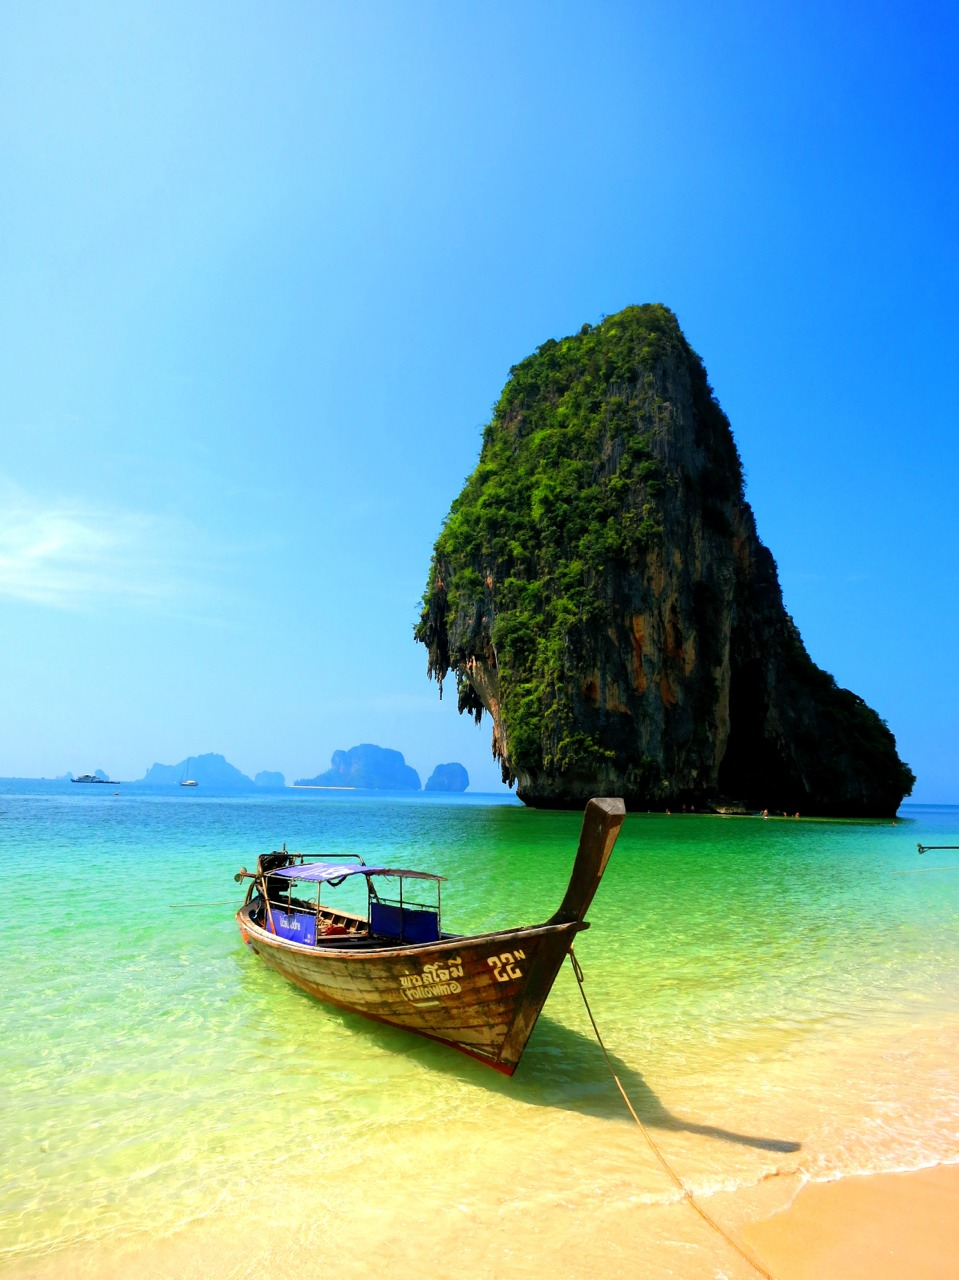 Phra Nang beach, Krabi.